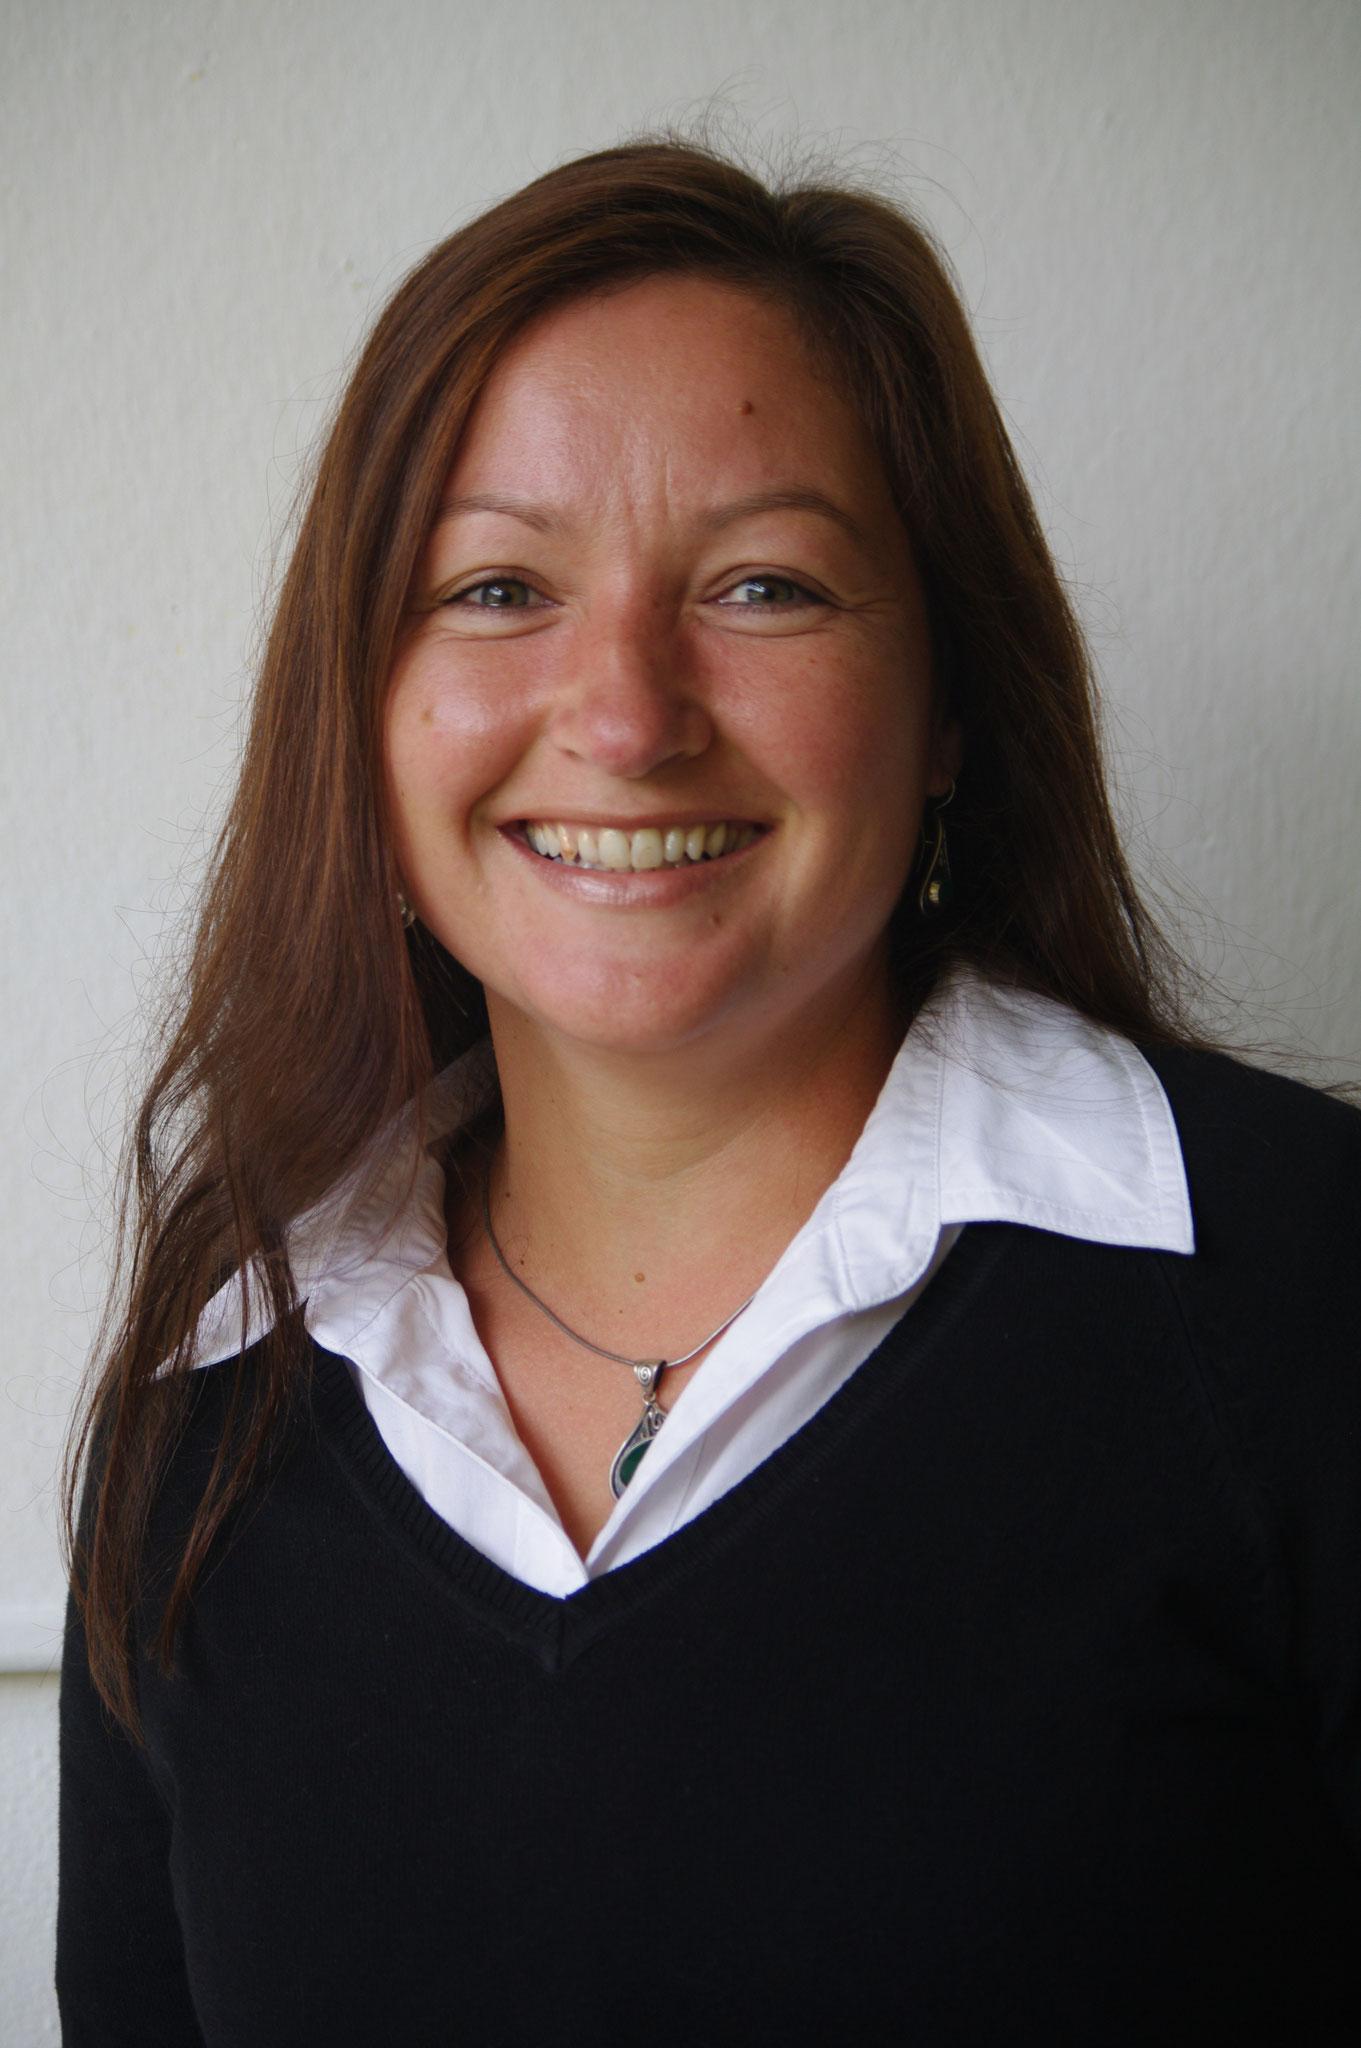 Jolanda Krech